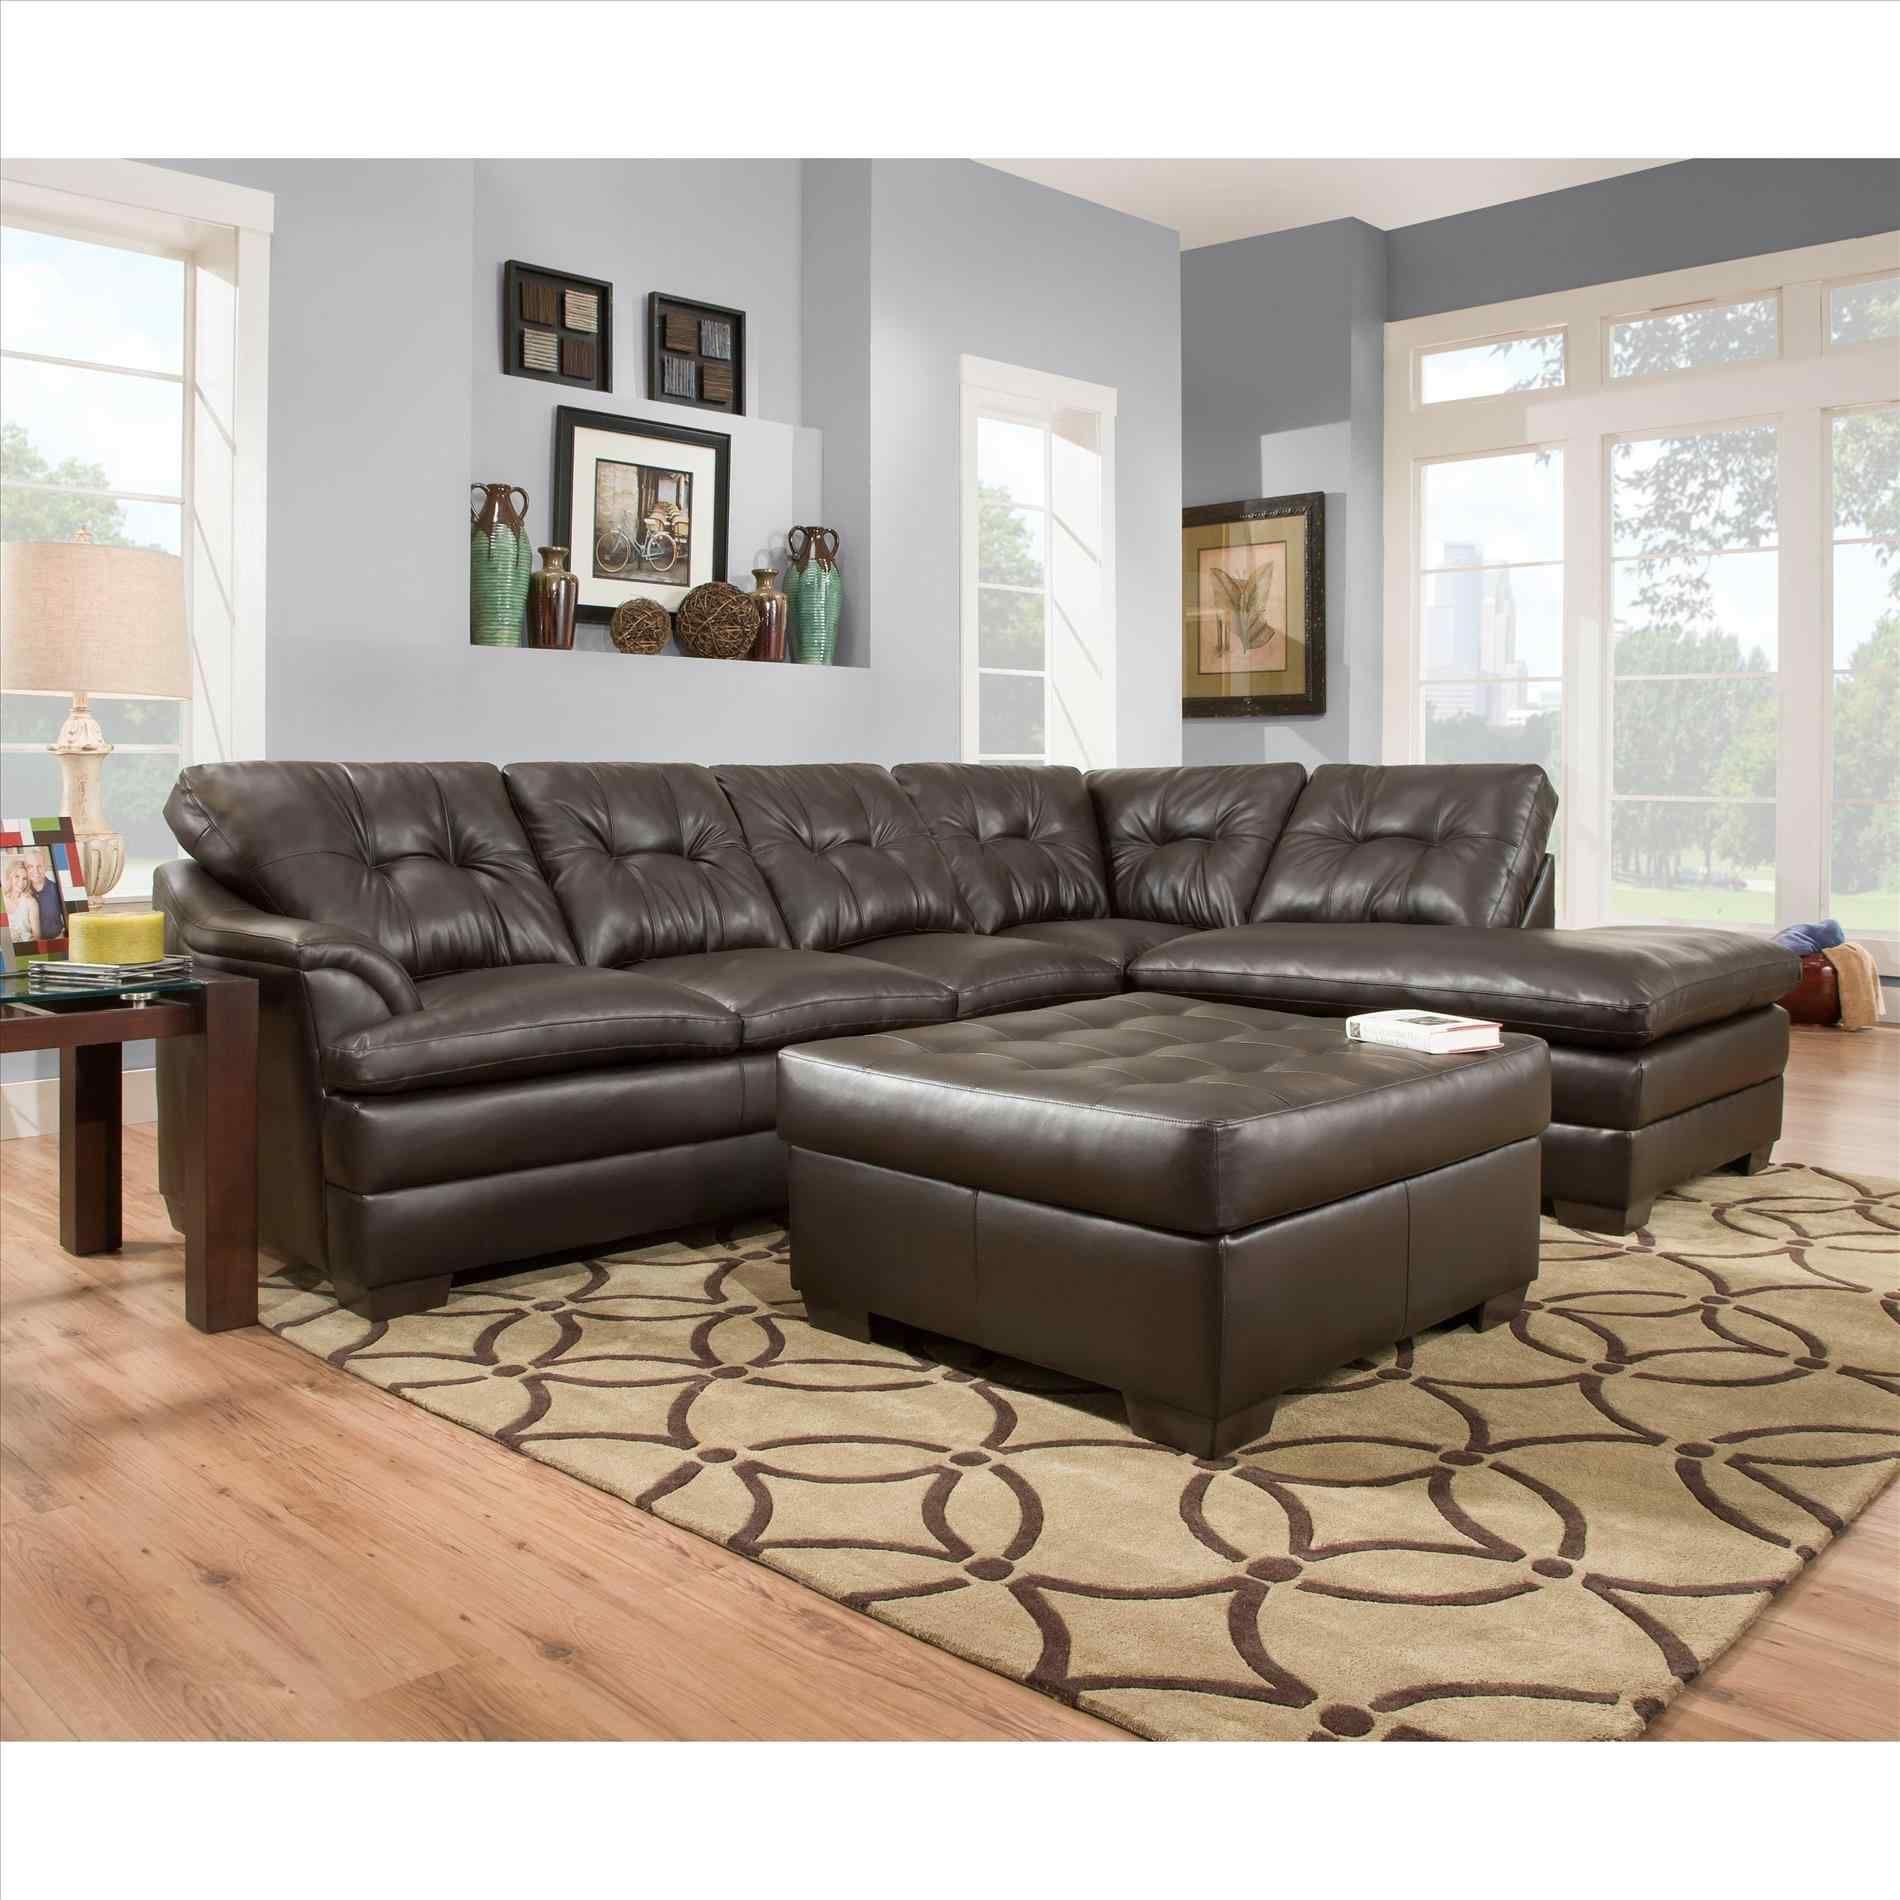 Merveilleux Sectional Sofa Reviews Run Upholstery Daisy U Wayfair Microfiber Microfiber Simmons  Sectional Sofa Reviews Garnet Ii Garnet Simmons Sectional Sofa Reviews ...